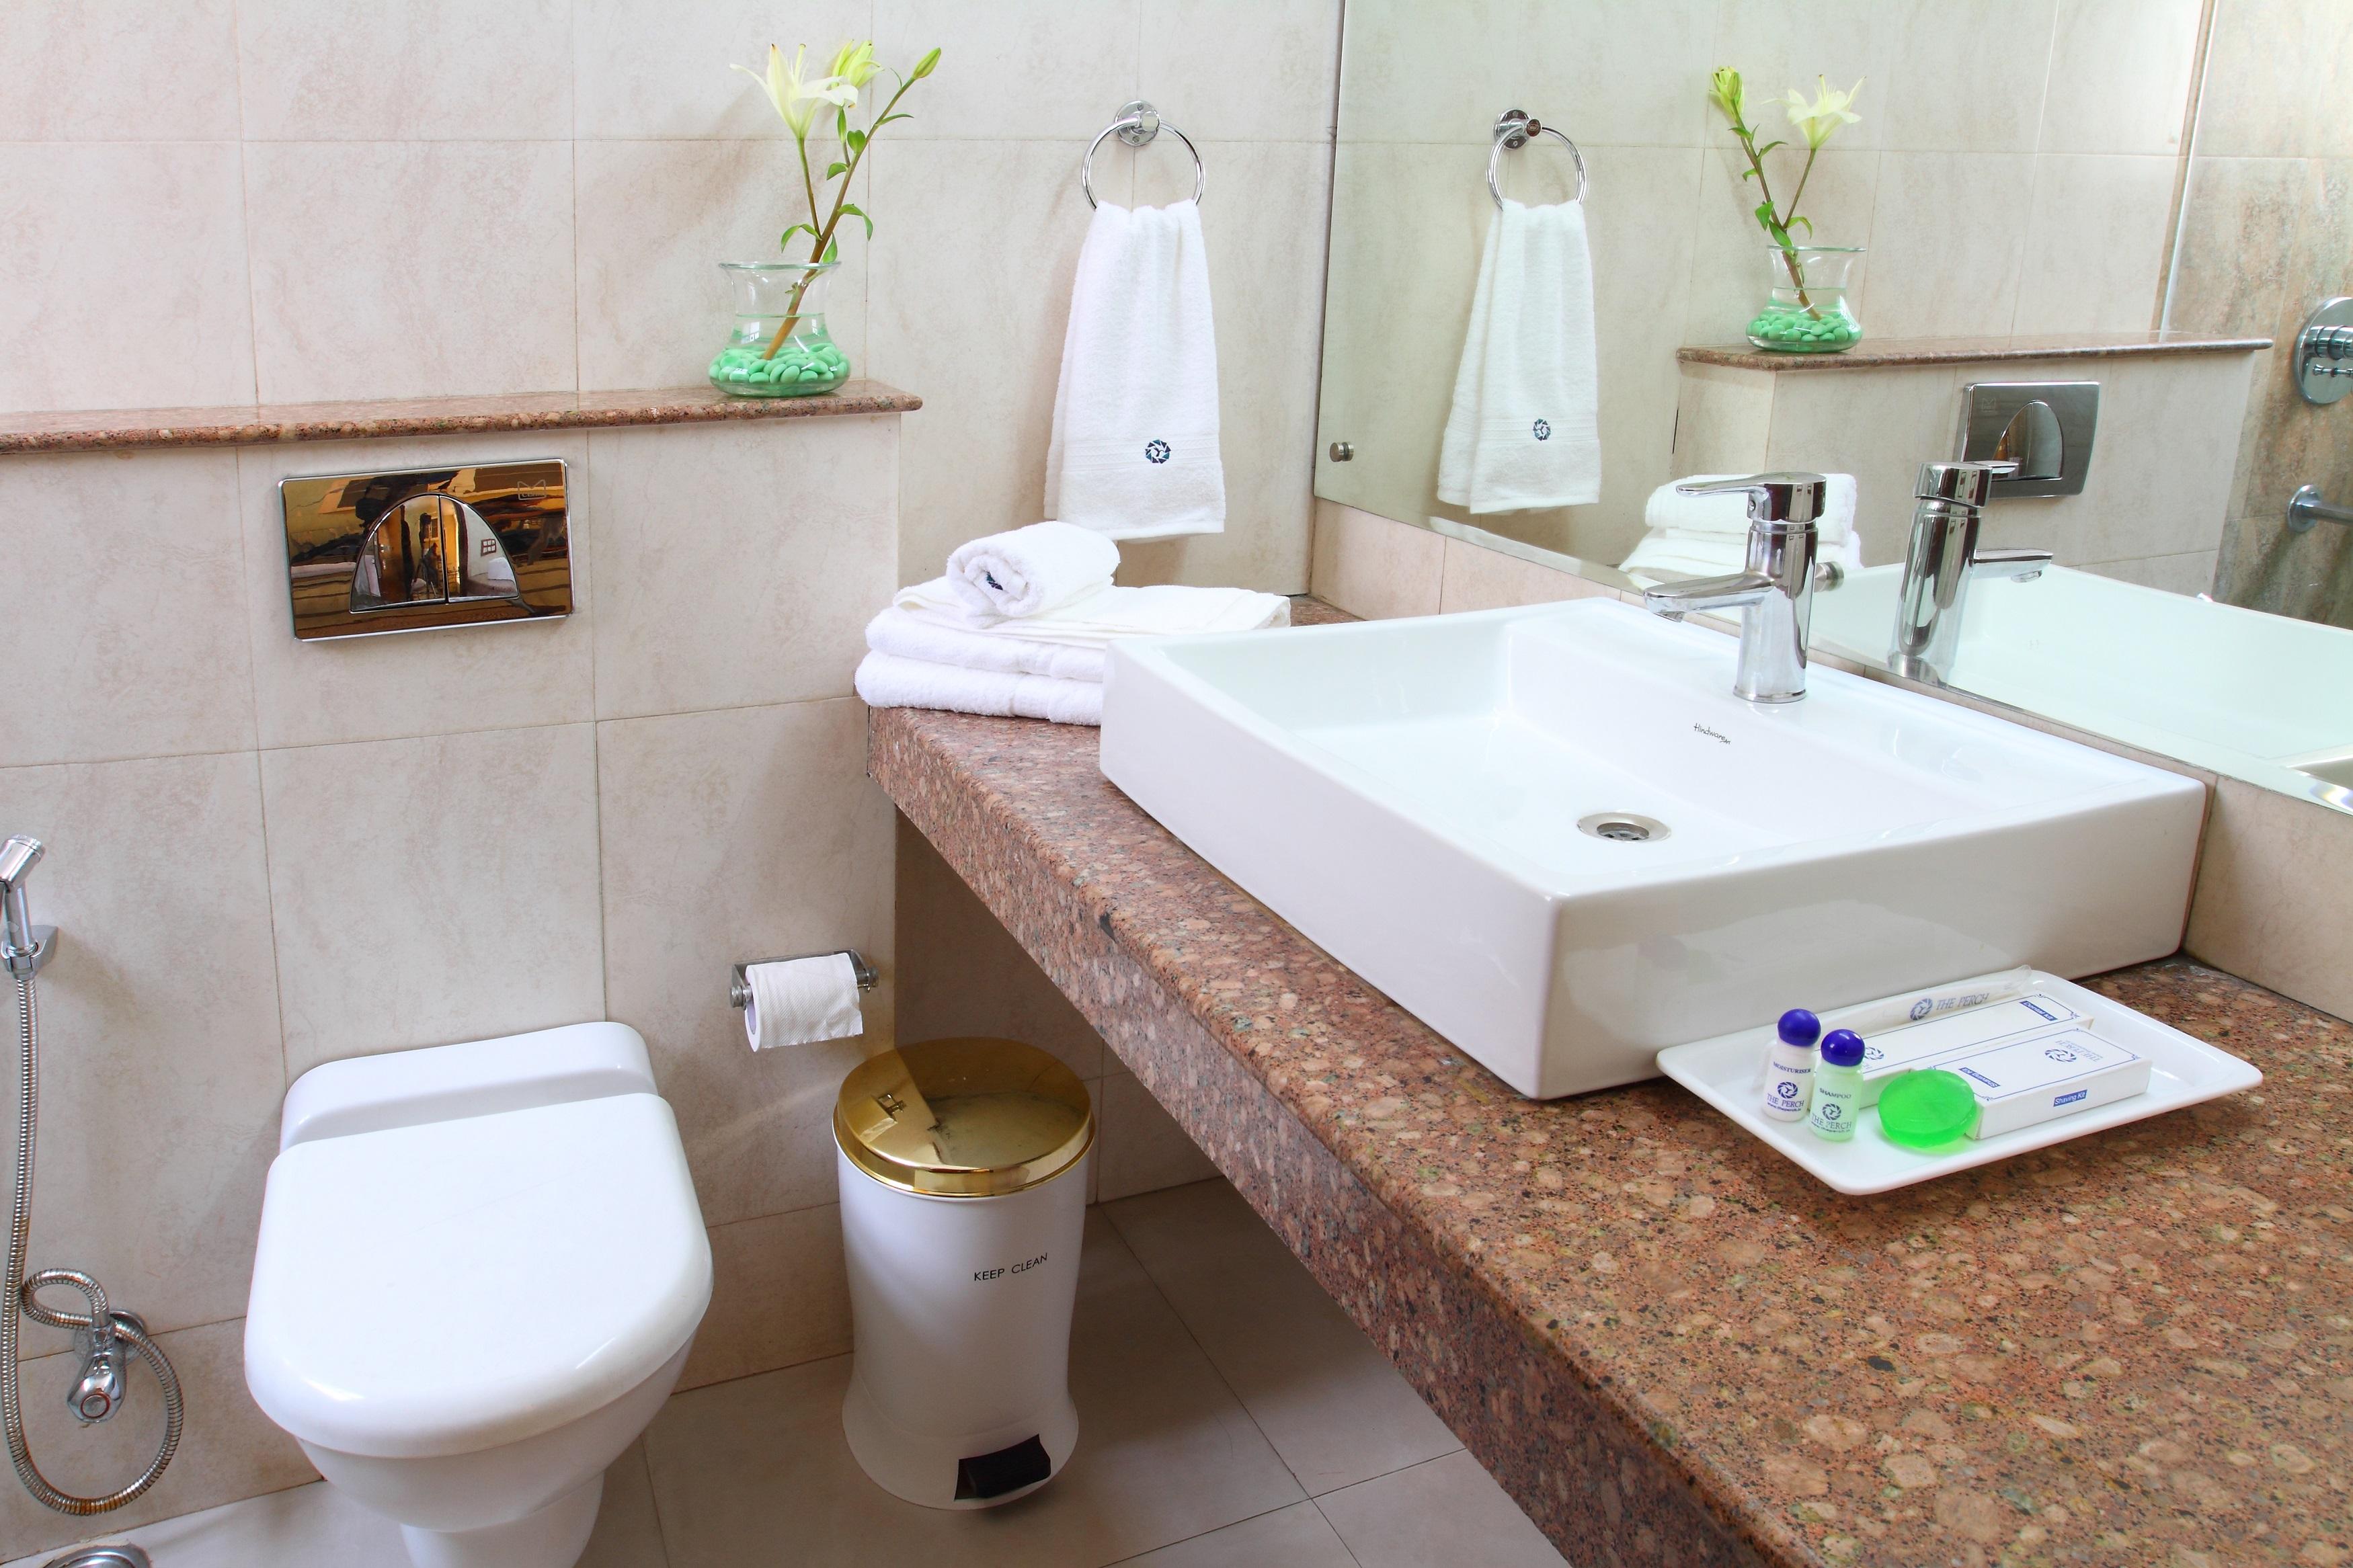 Perch Arbor - Golf Course Road, Winsome Room Bathroom